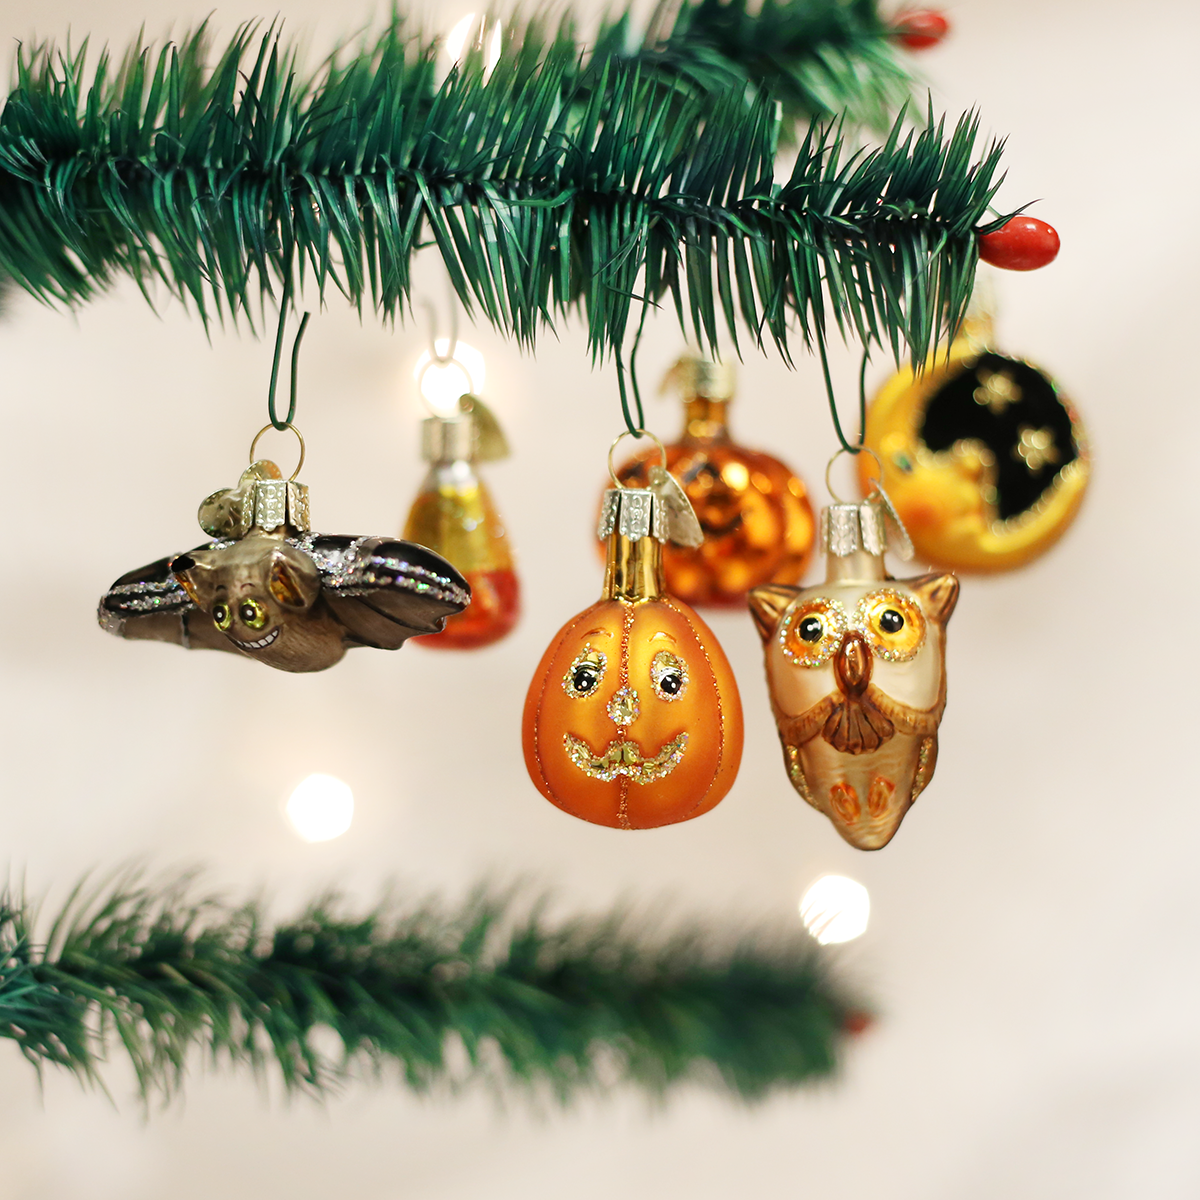 Mini Halloween Assortment Halloween ornaments, Old world